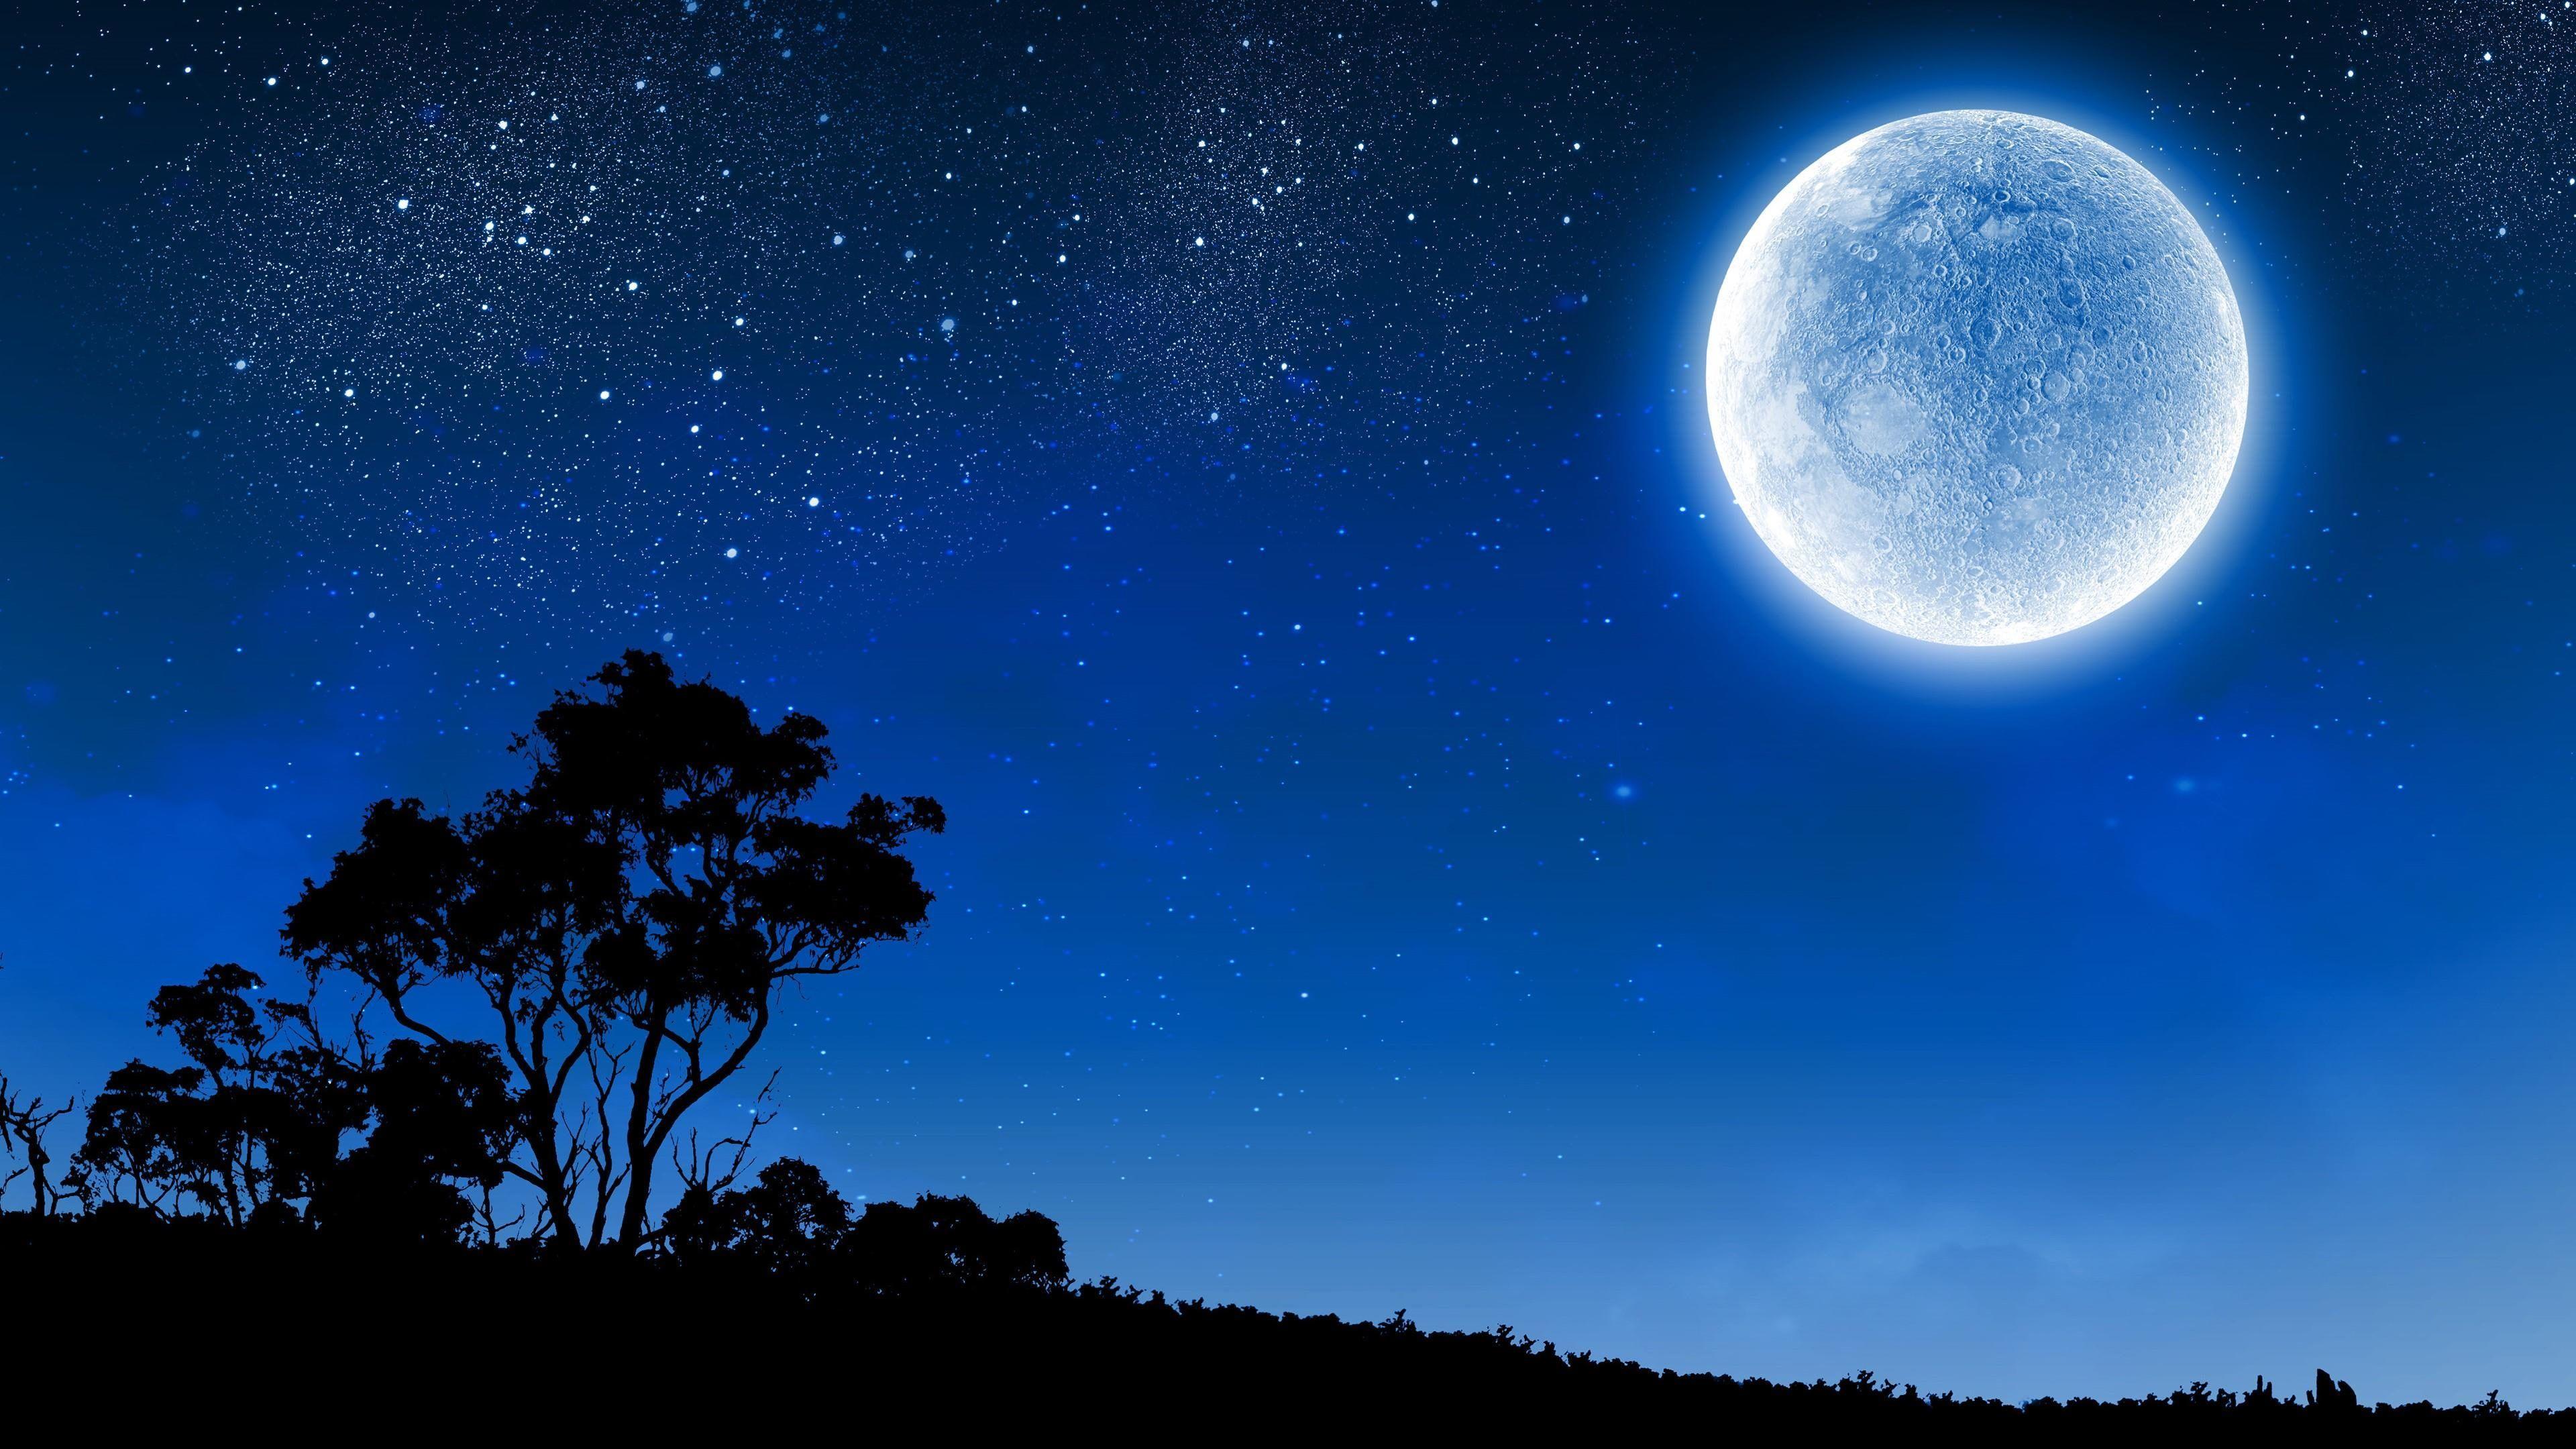 Moon Full Moon Night Night Sky Starry Silhouette Starry Night 4k Wallpaper Hdwallpaper Desktop Starry Night Wallpaper Full Moon Night Skies Best of full moon night hd wallpaper